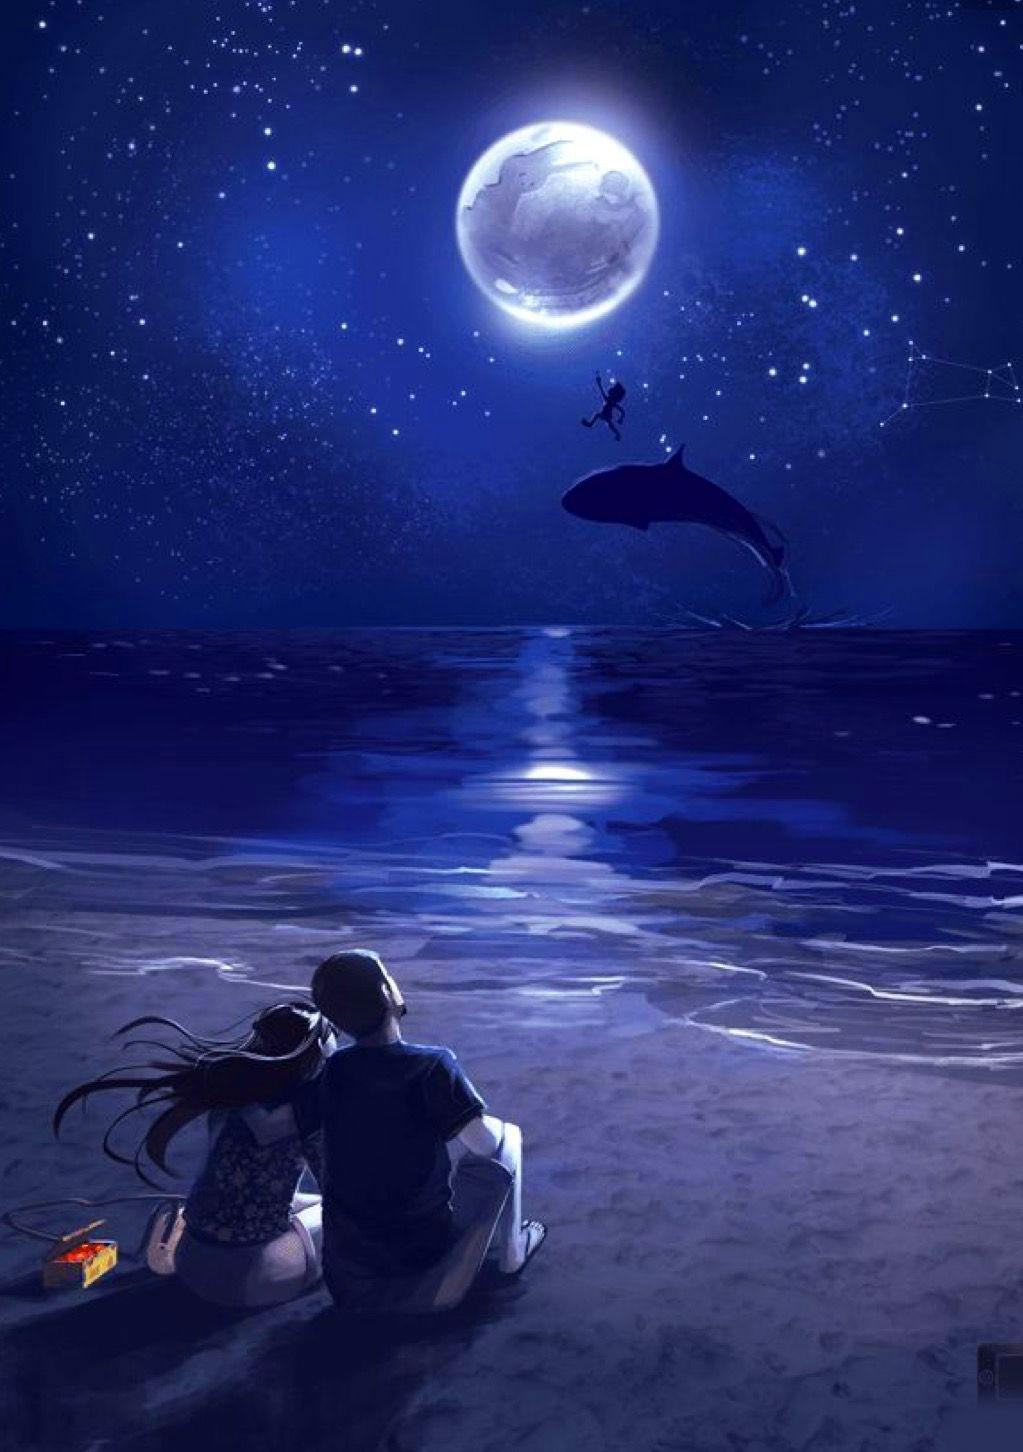 moon Girlfriend Whatsapp Profile Images